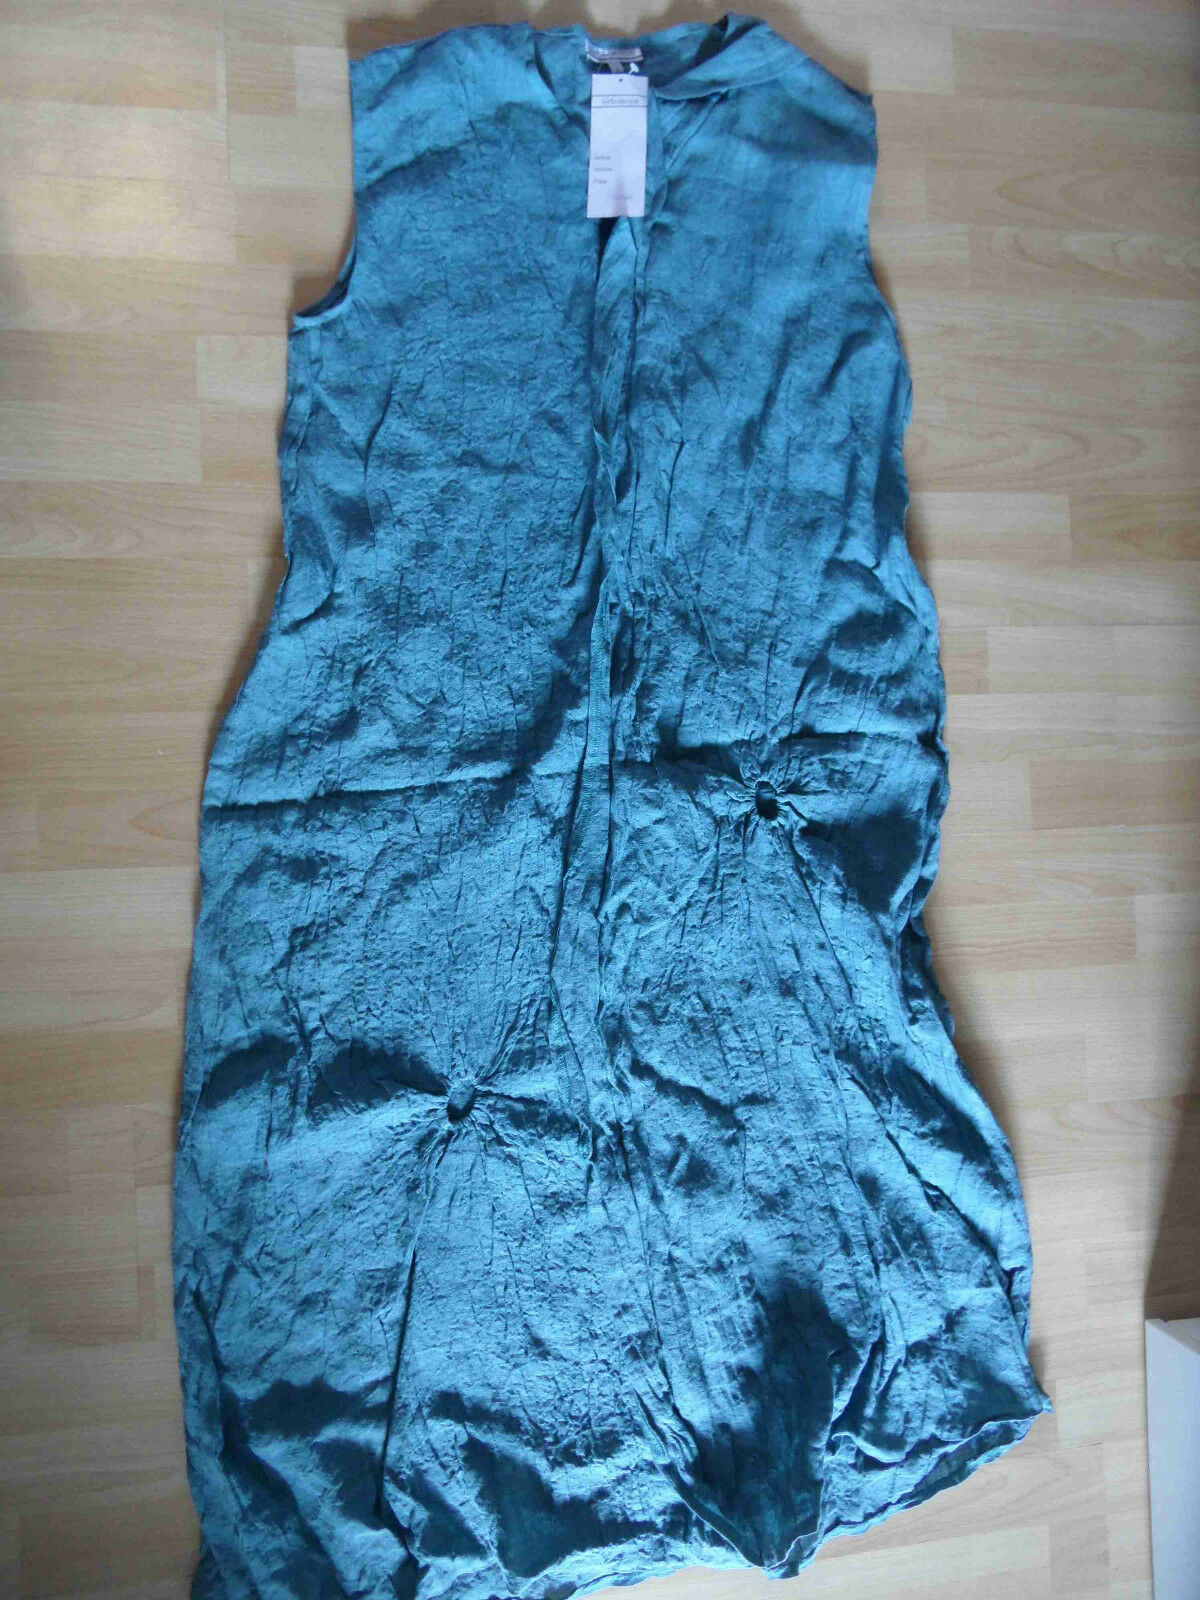 TURBULENCE schönes langes Leinen-Kleid grünblau Gr. 2 NEU HMI815